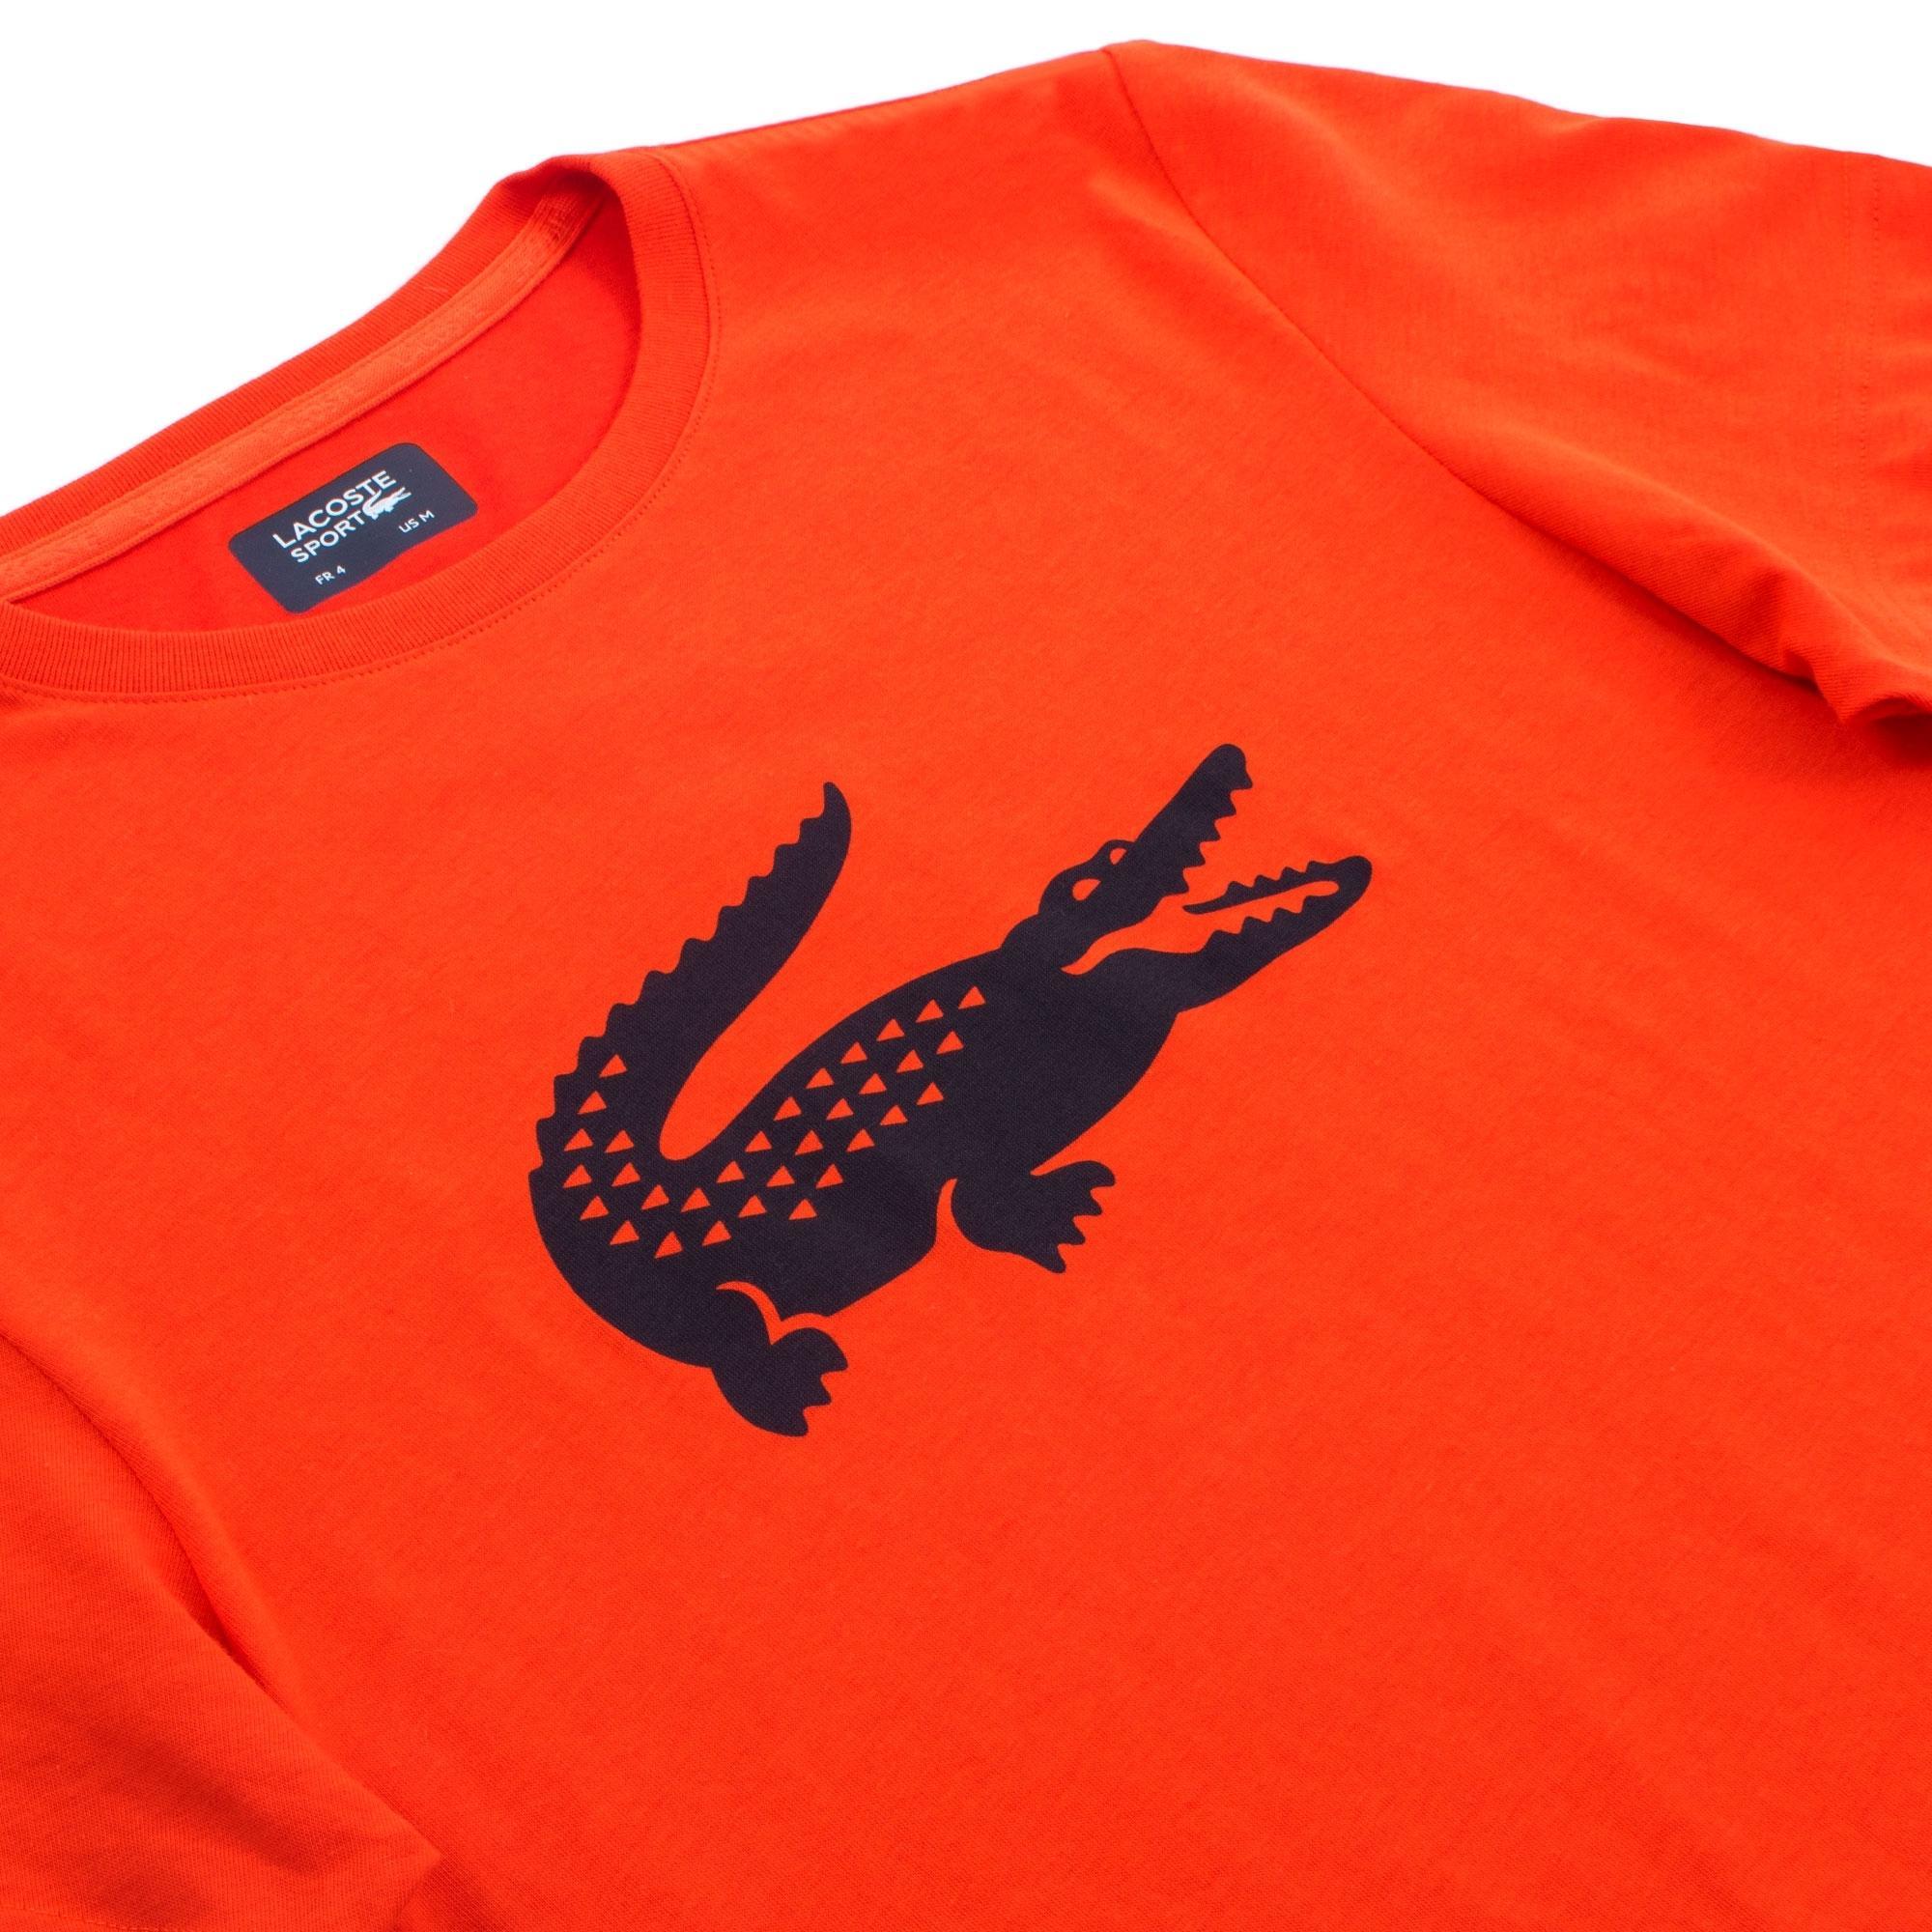 5a5269f2 Lacoste Sport - Orange Crocodile Technical Jersey Tennis T-shirt for Men -  Lyst. View fullscreen